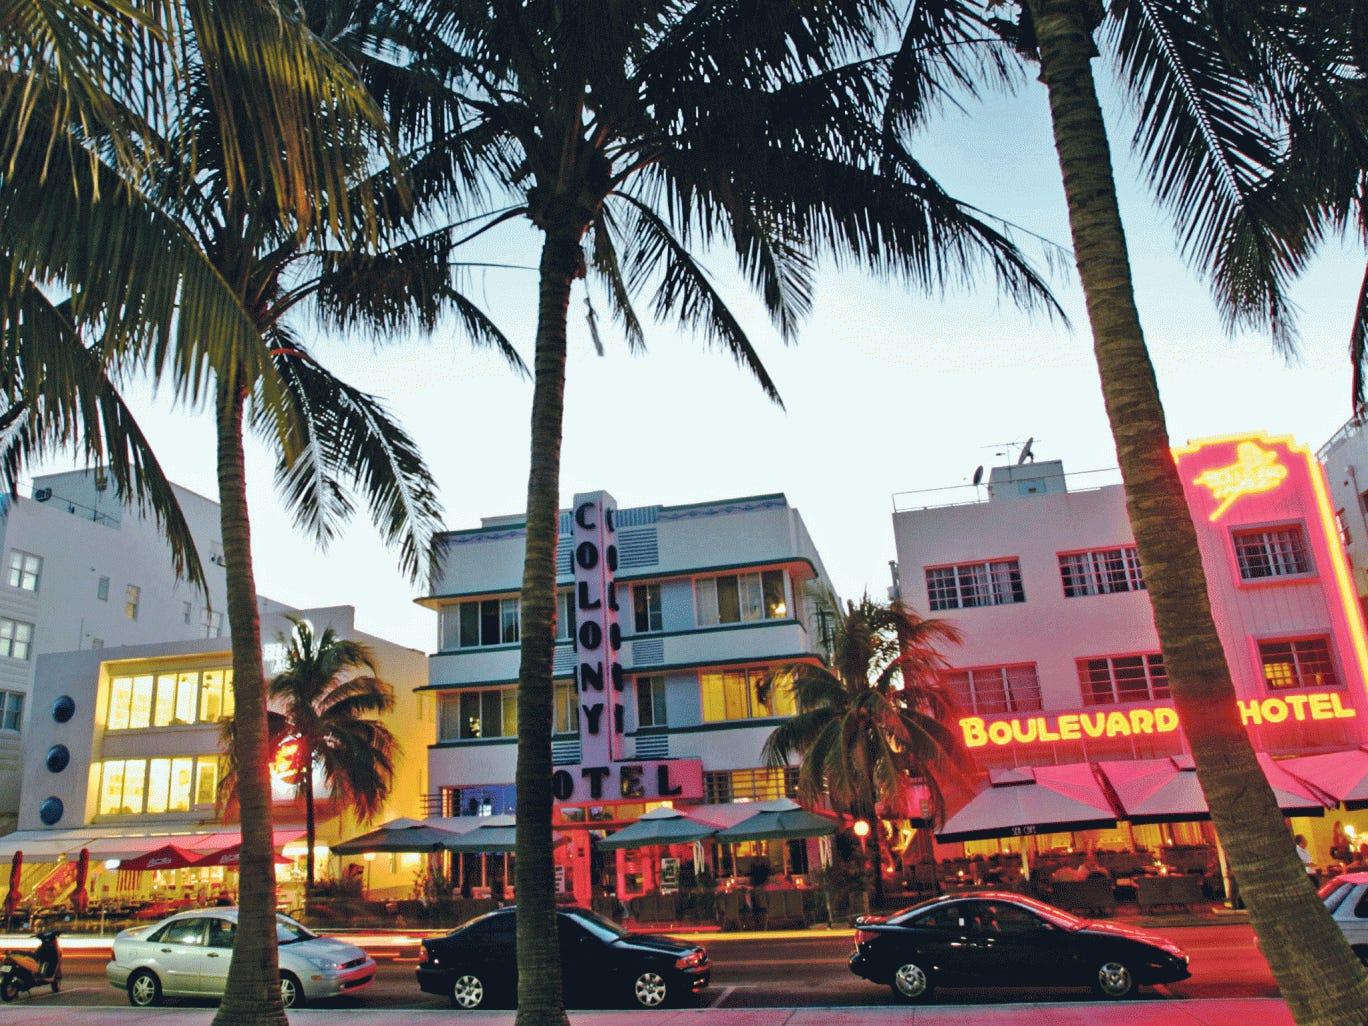 Deco delights: Ocean Drive